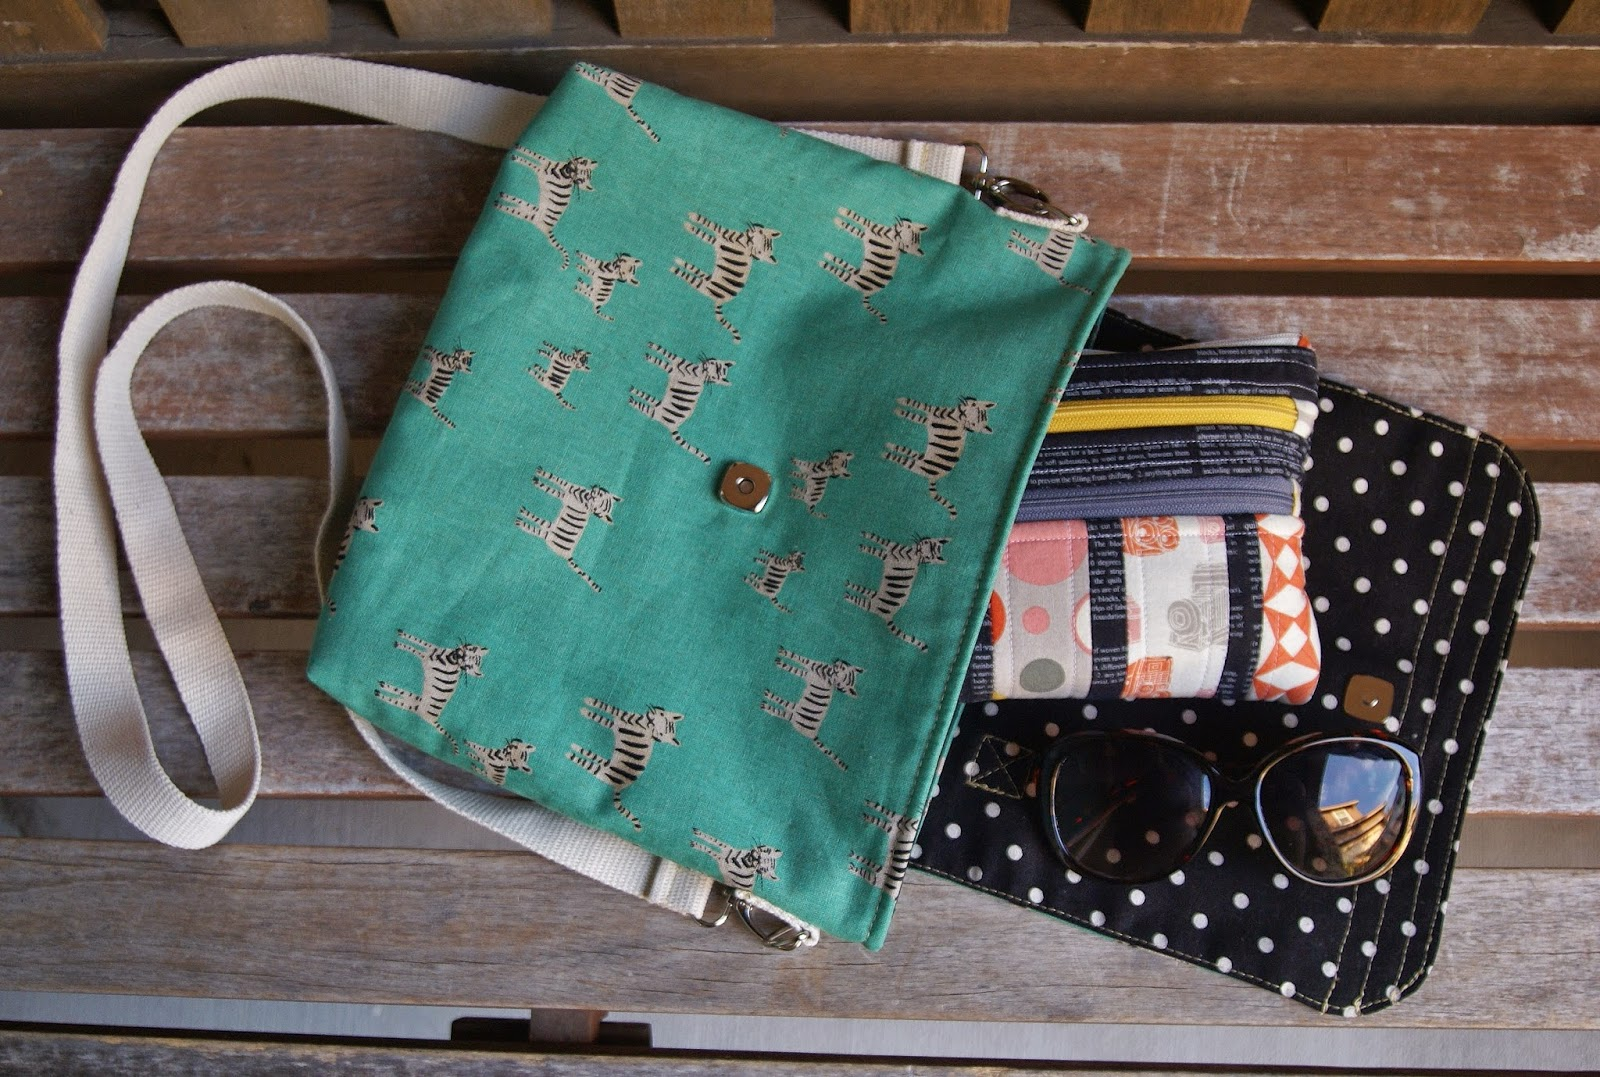 Cotton + Steel Tiger Tracks Satchel by Heidi Staples of Fabric Mutt